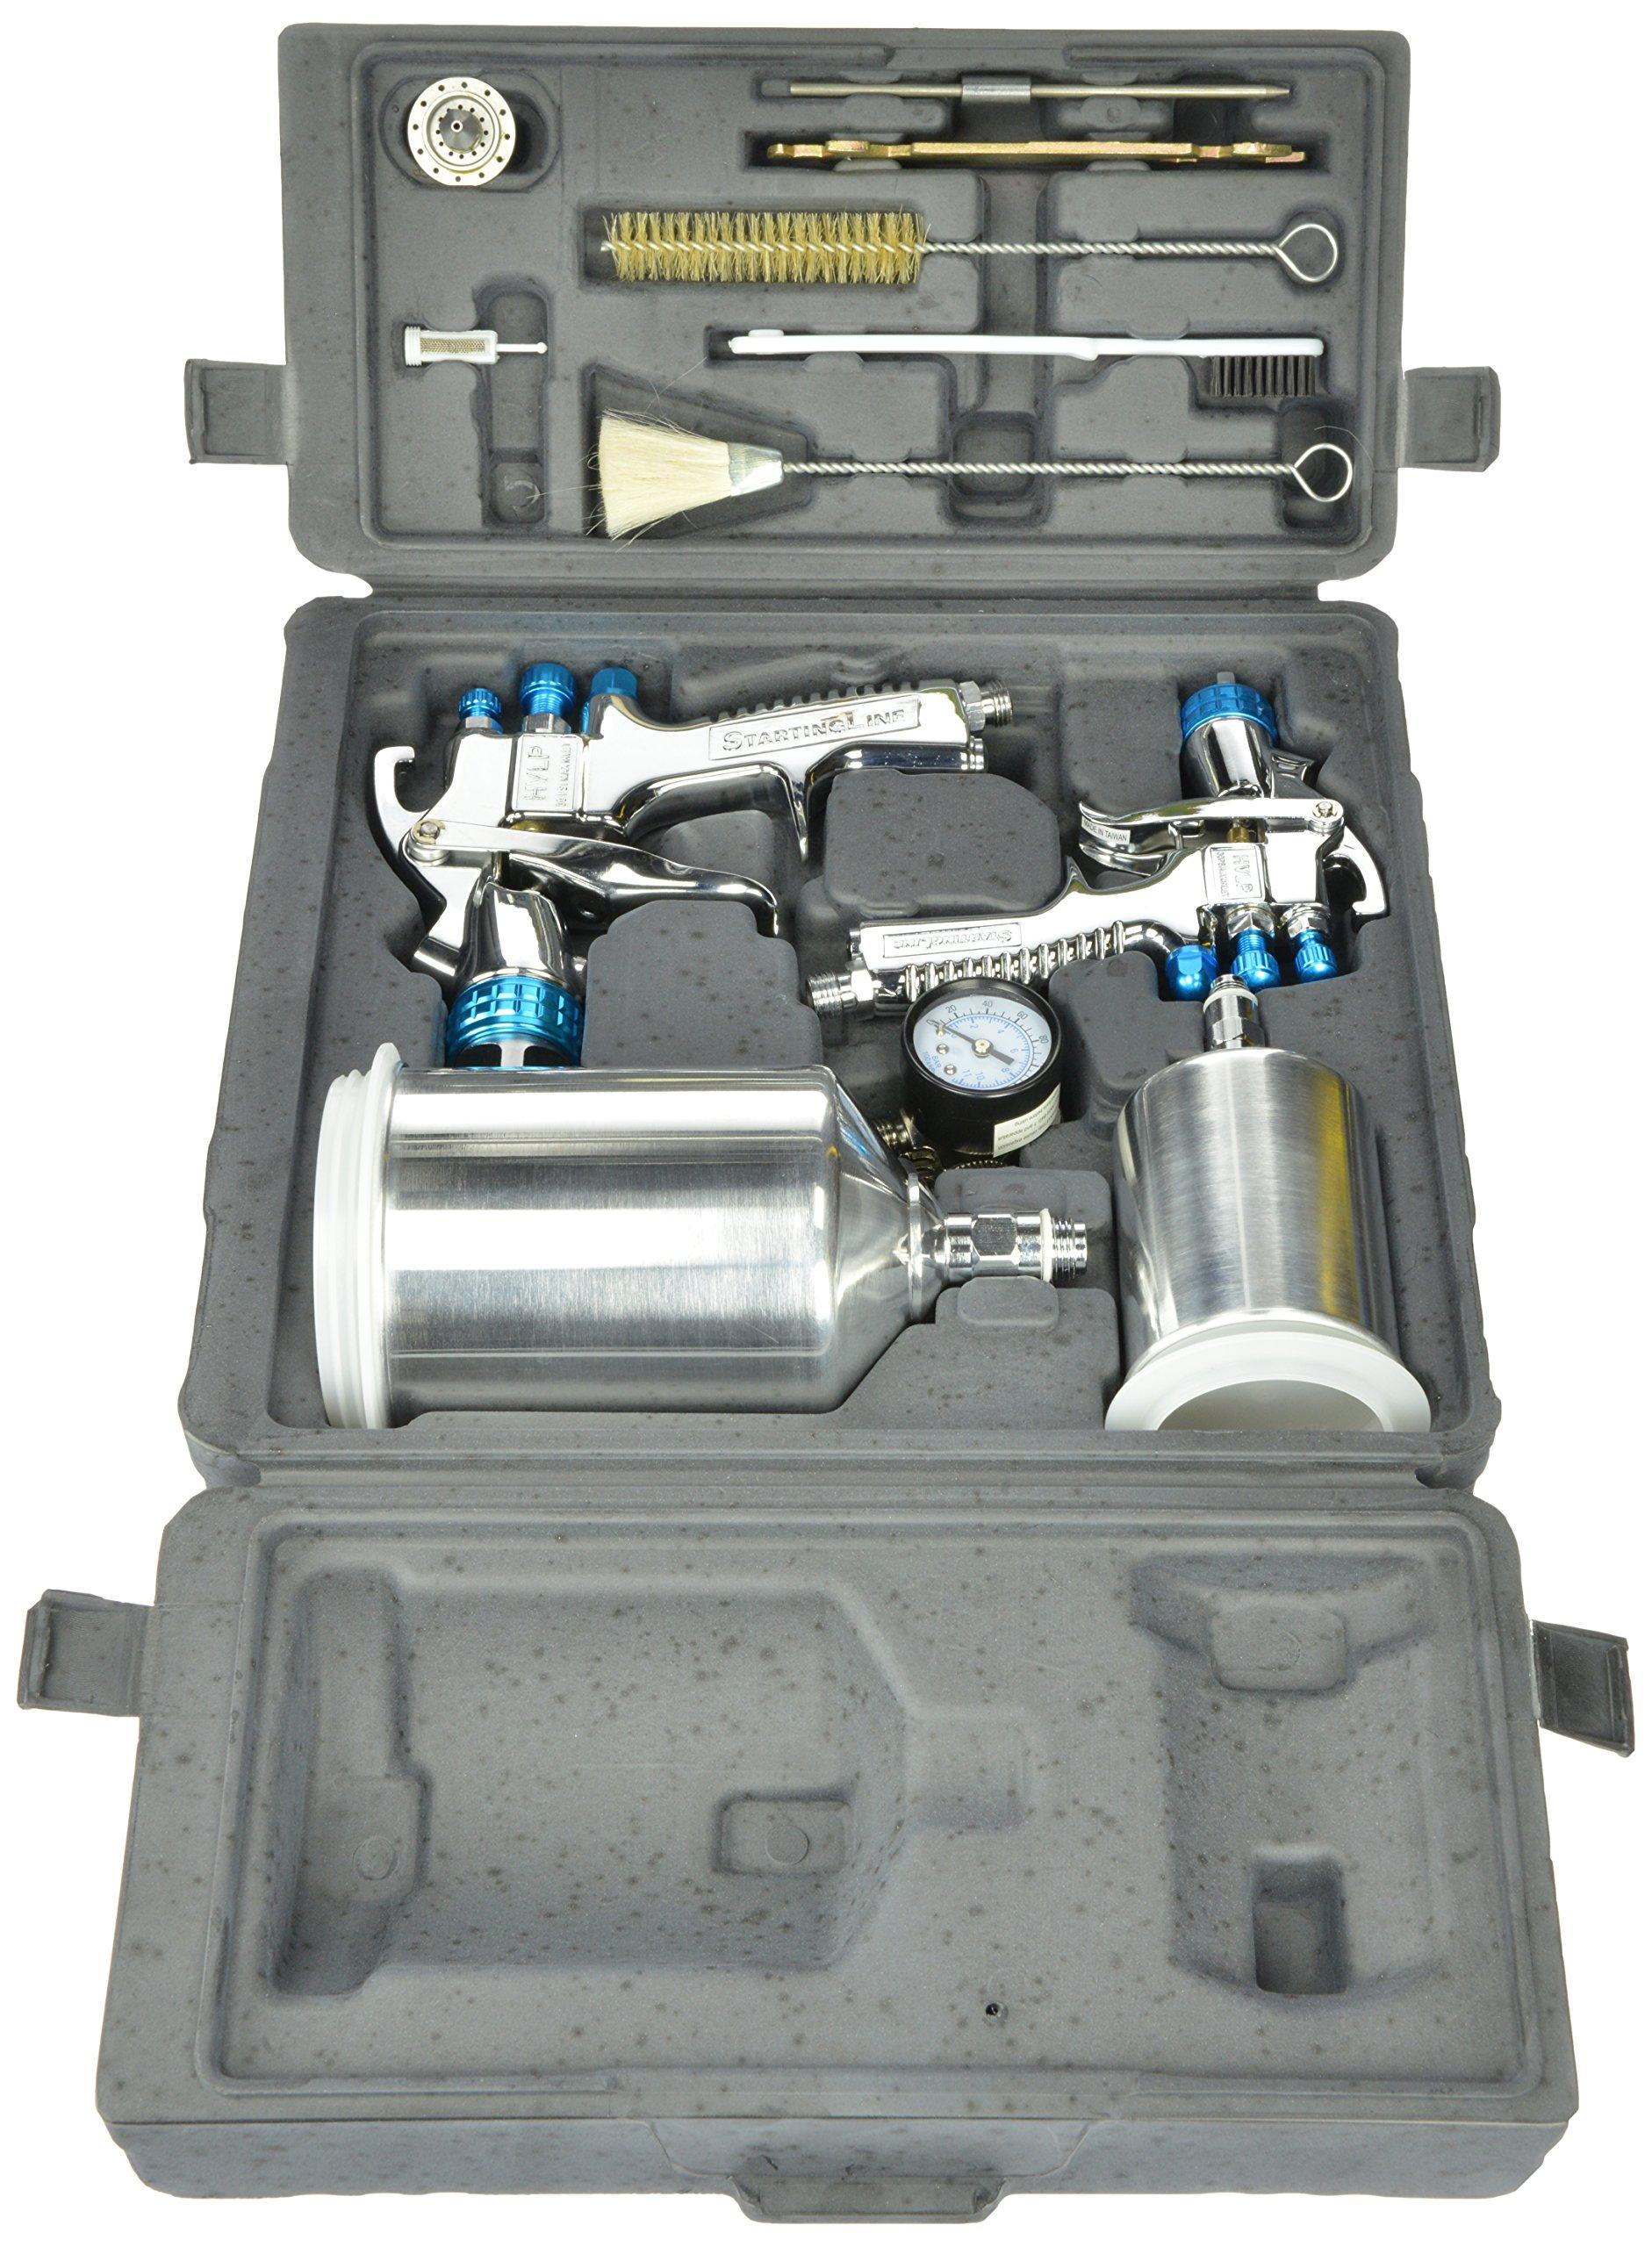 Pistola Para Pintar Devilbiss 802342 Startingline Hvlp Kit